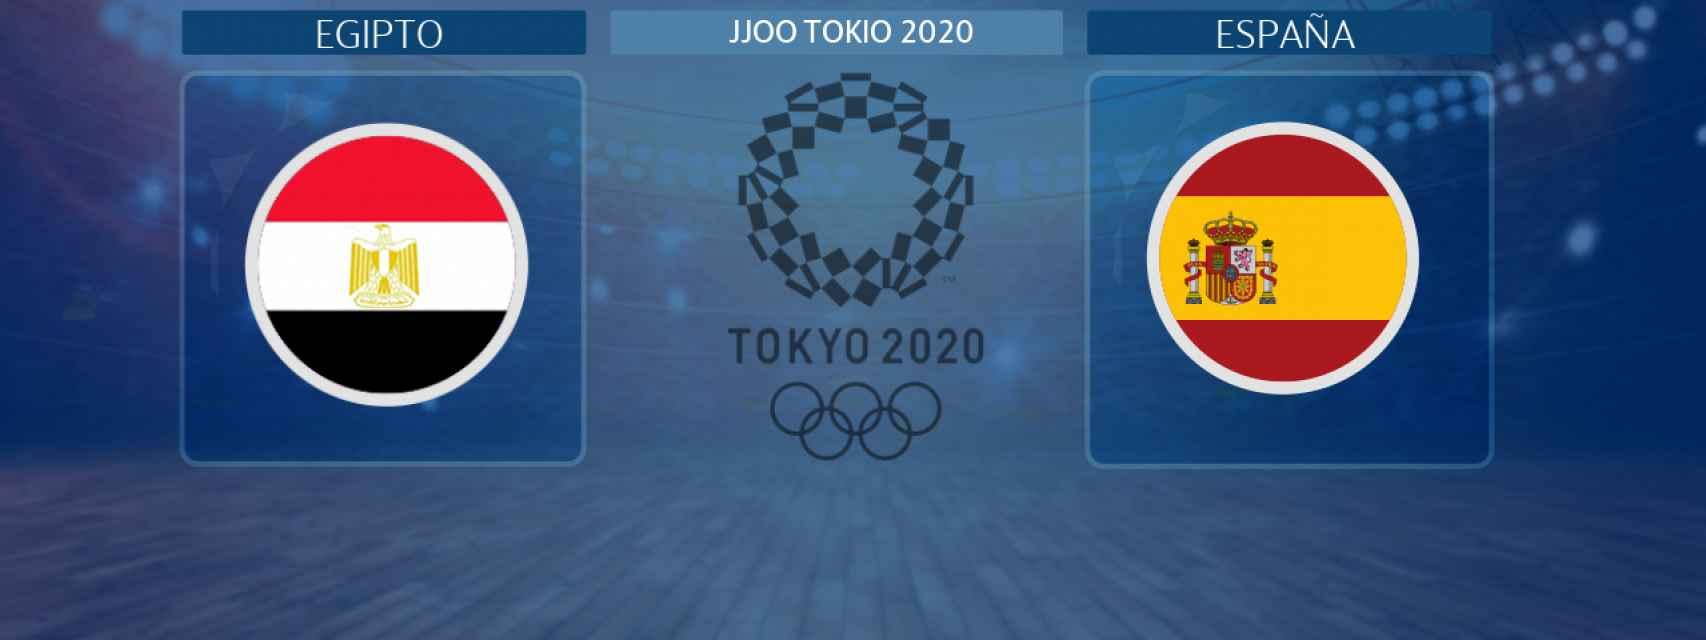 Egipto - España, partido de los JJOO de Tokio 2020